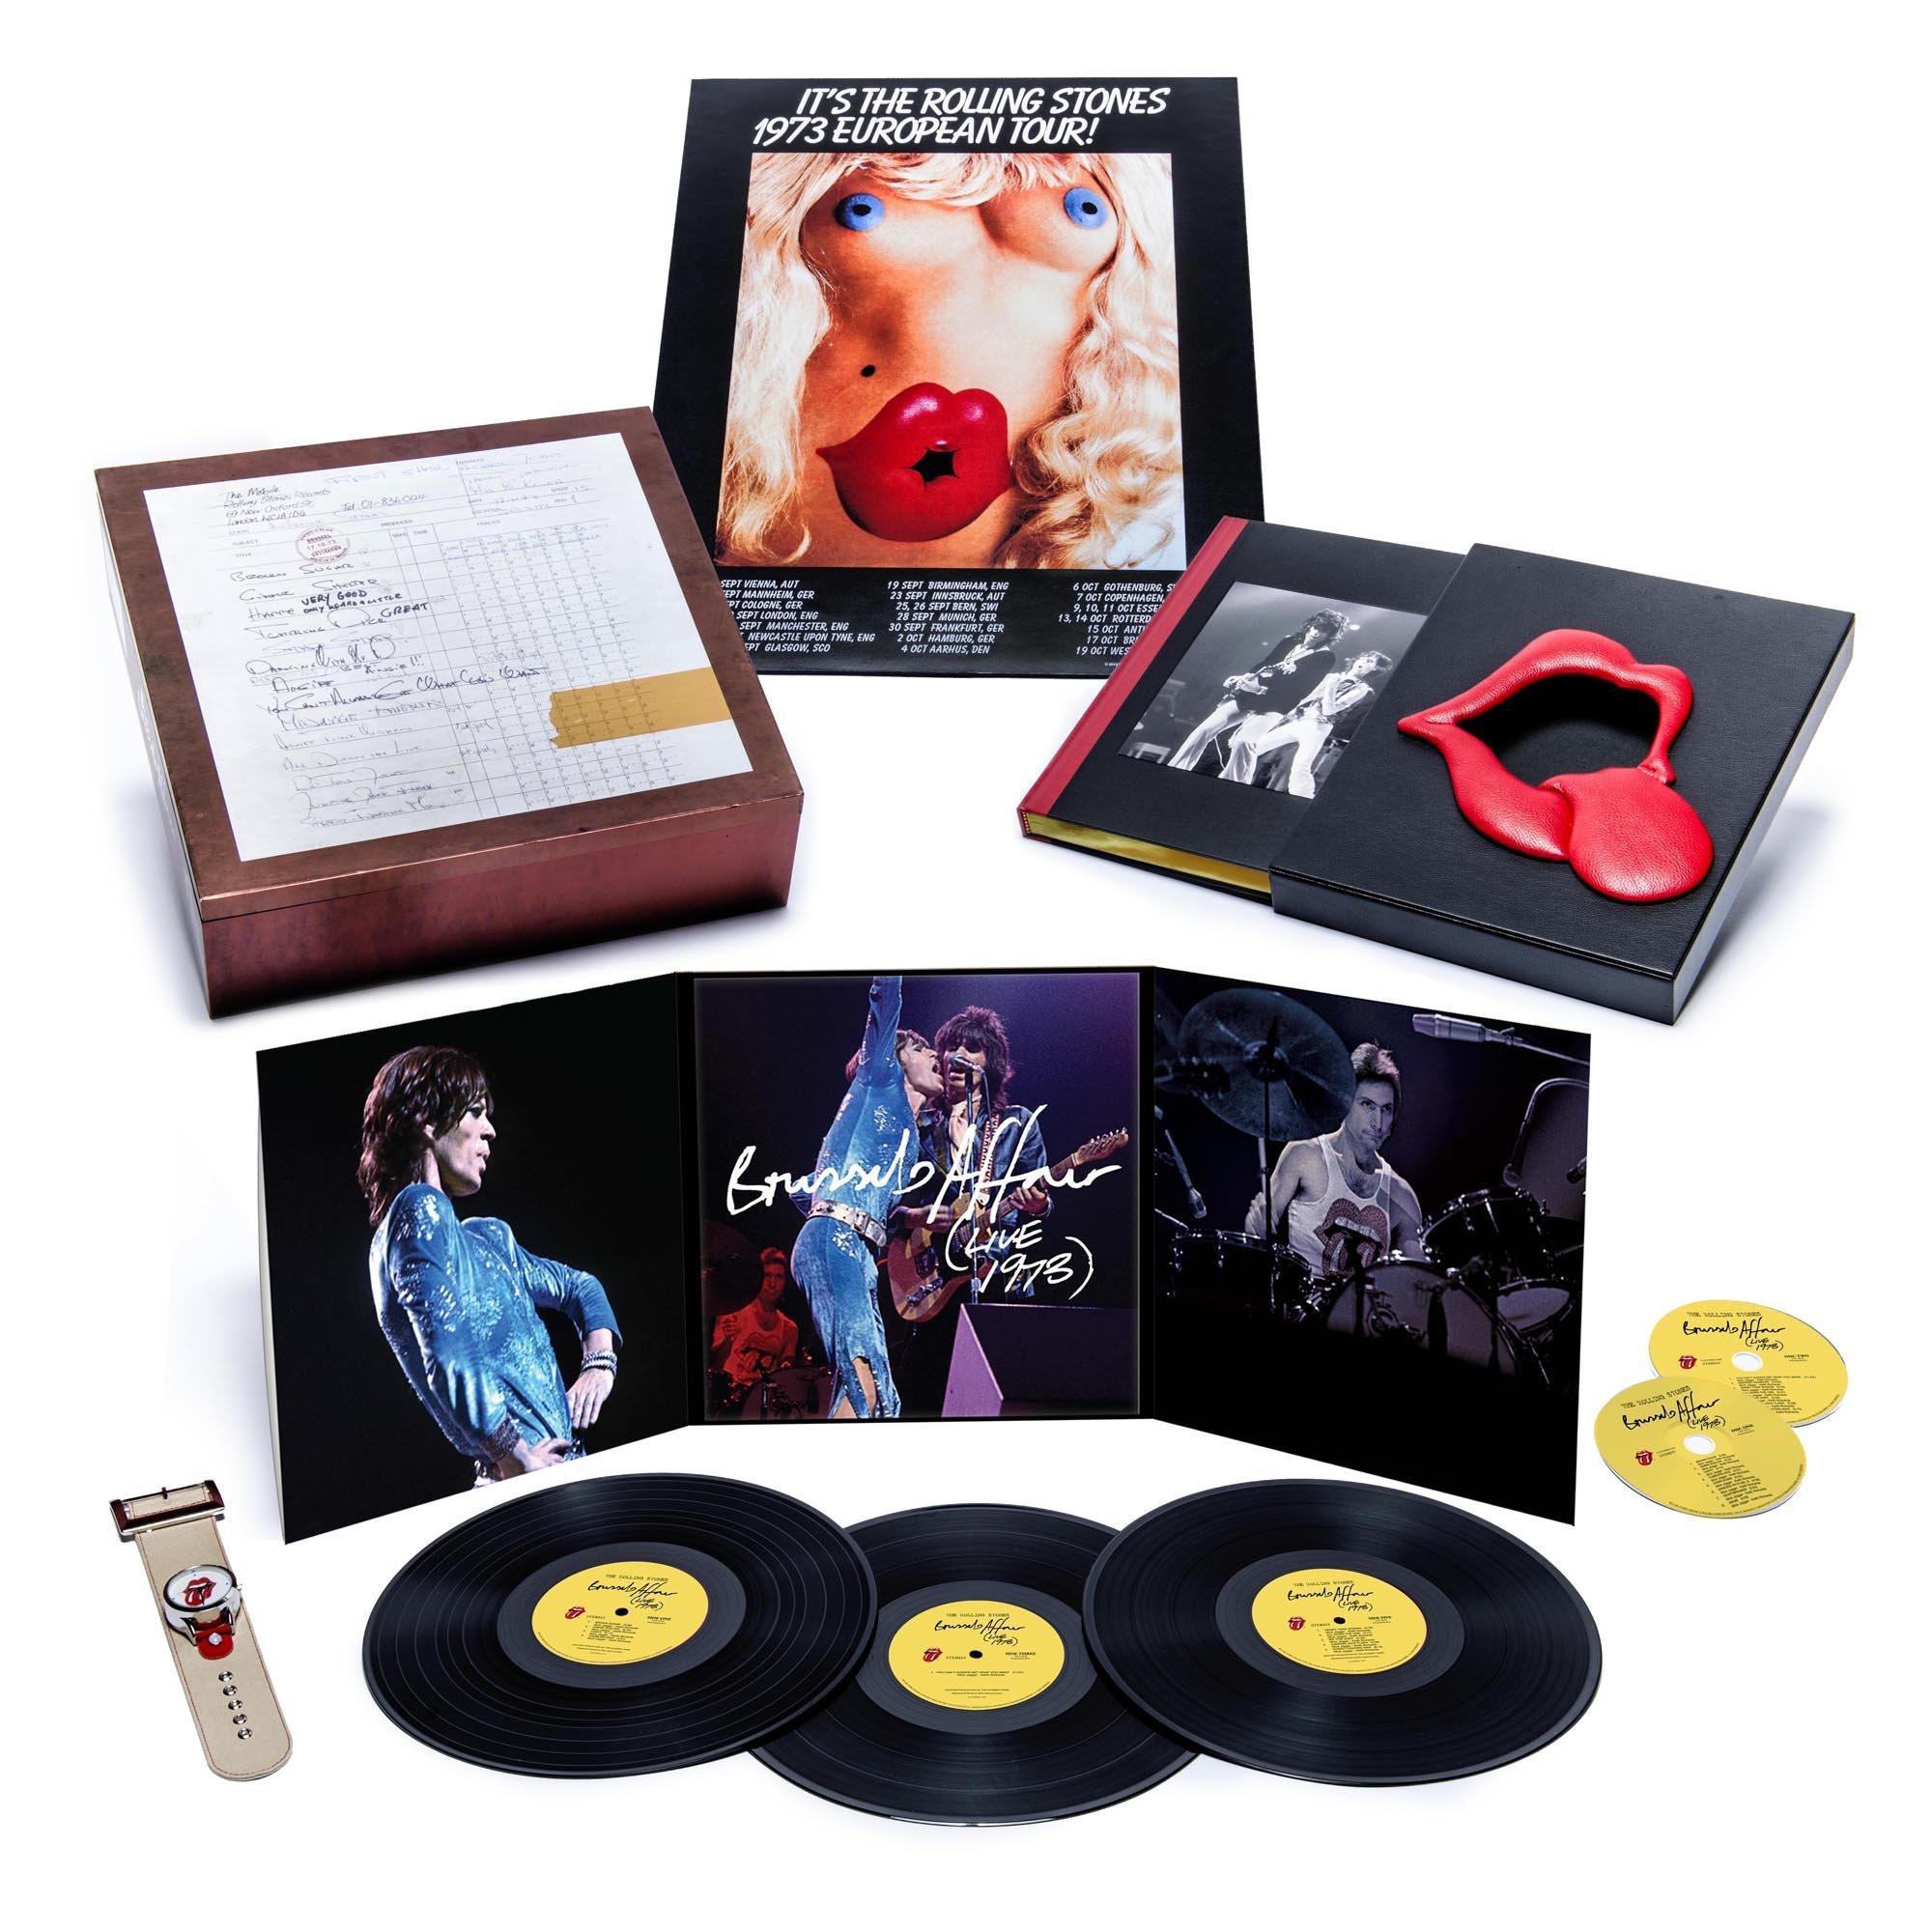 IMWAN • [2012-12-18] The Rolling Stones